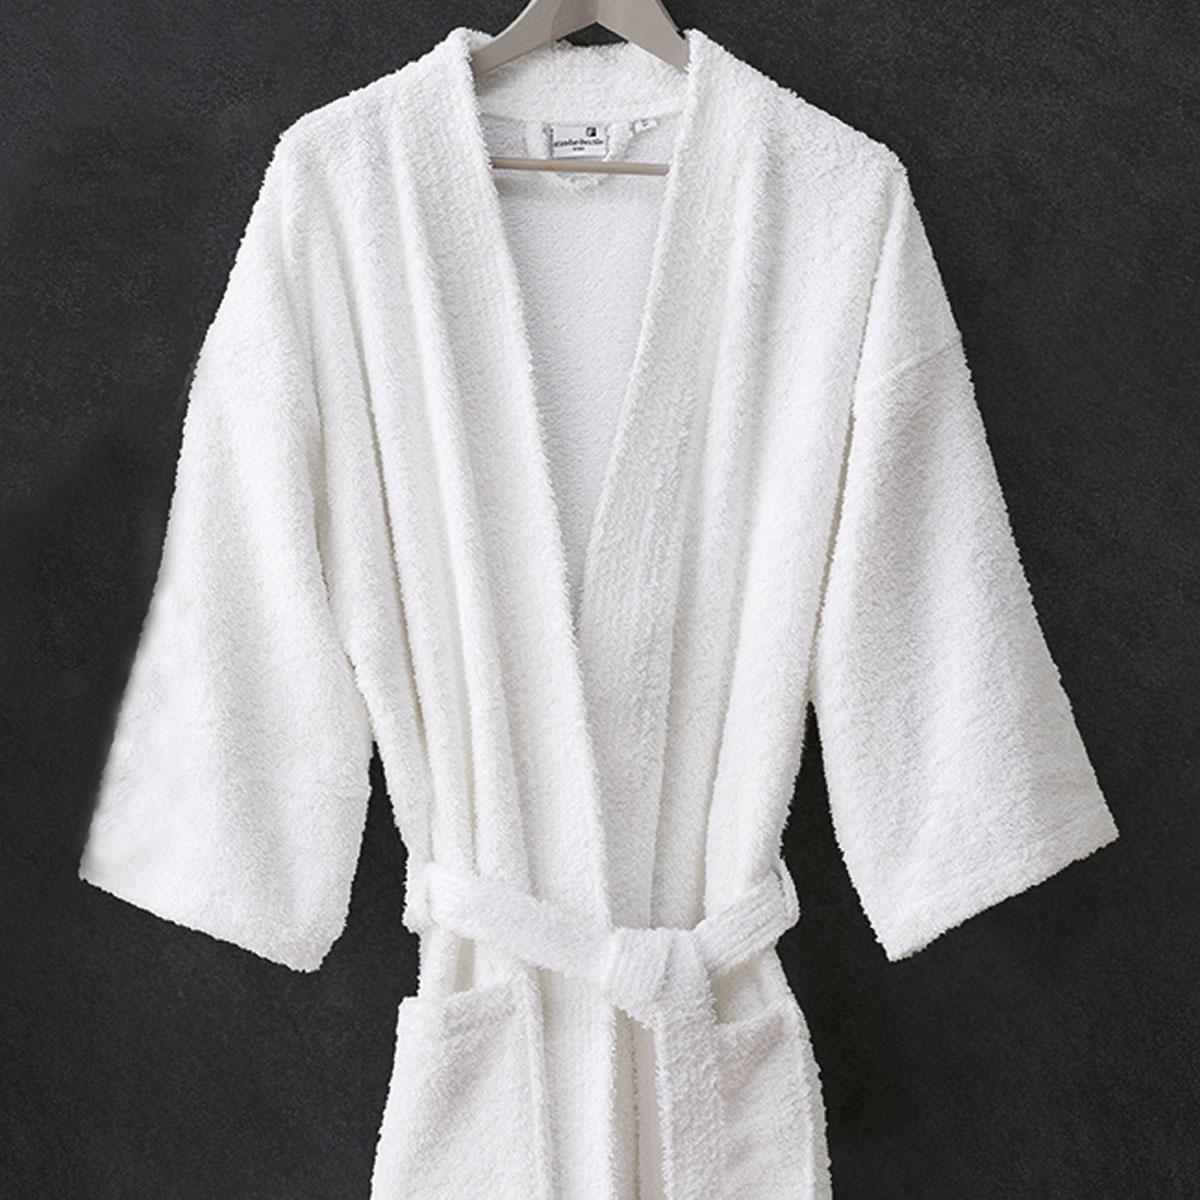 peignoir paola col kimono boucle intirable standard textile. Black Bedroom Furniture Sets. Home Design Ideas